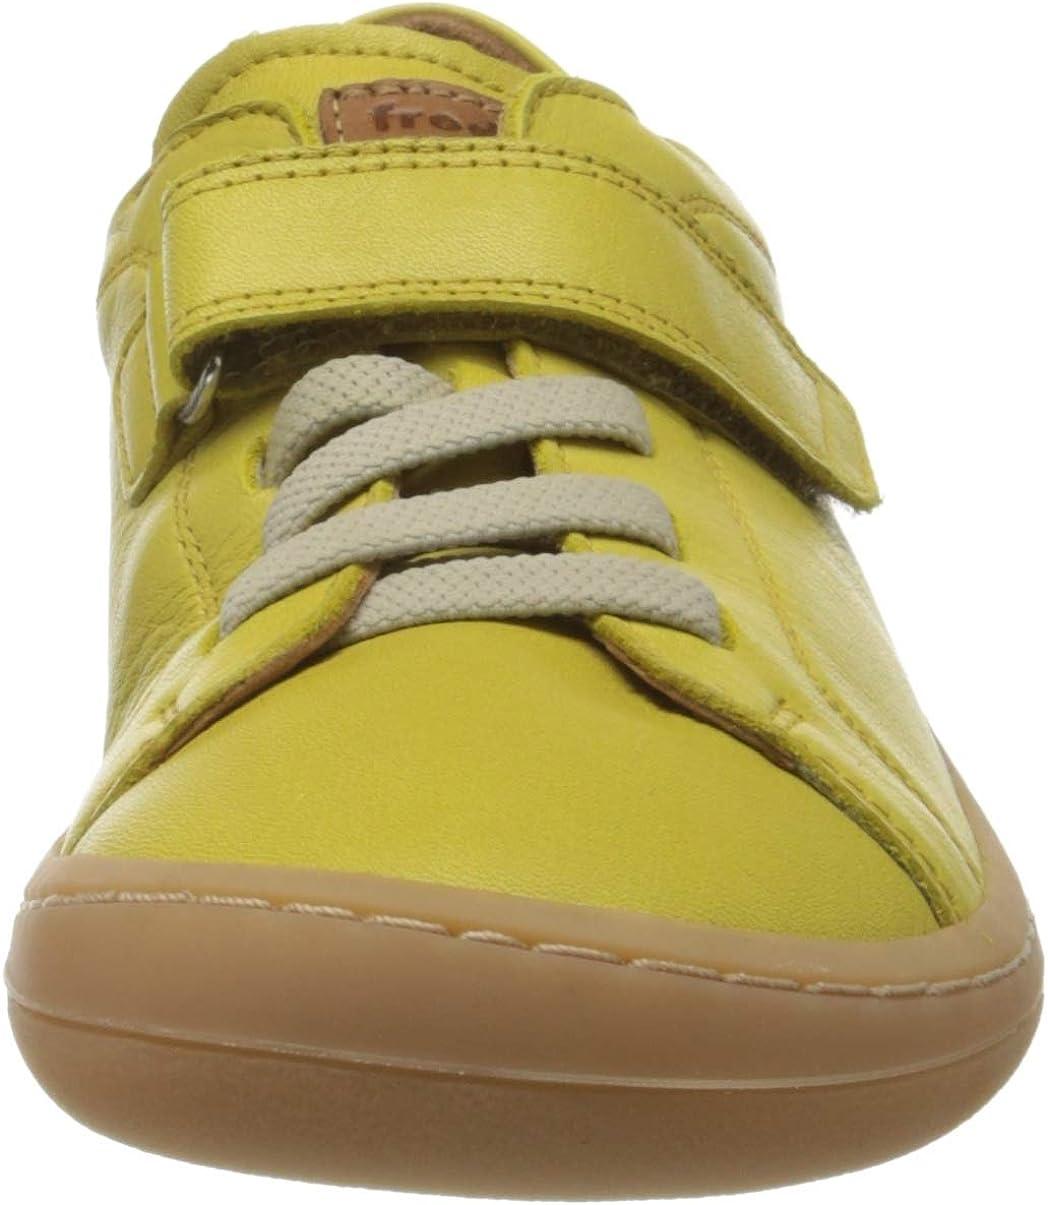 Froddo G3130149 Girls Shoe Brogues Fille